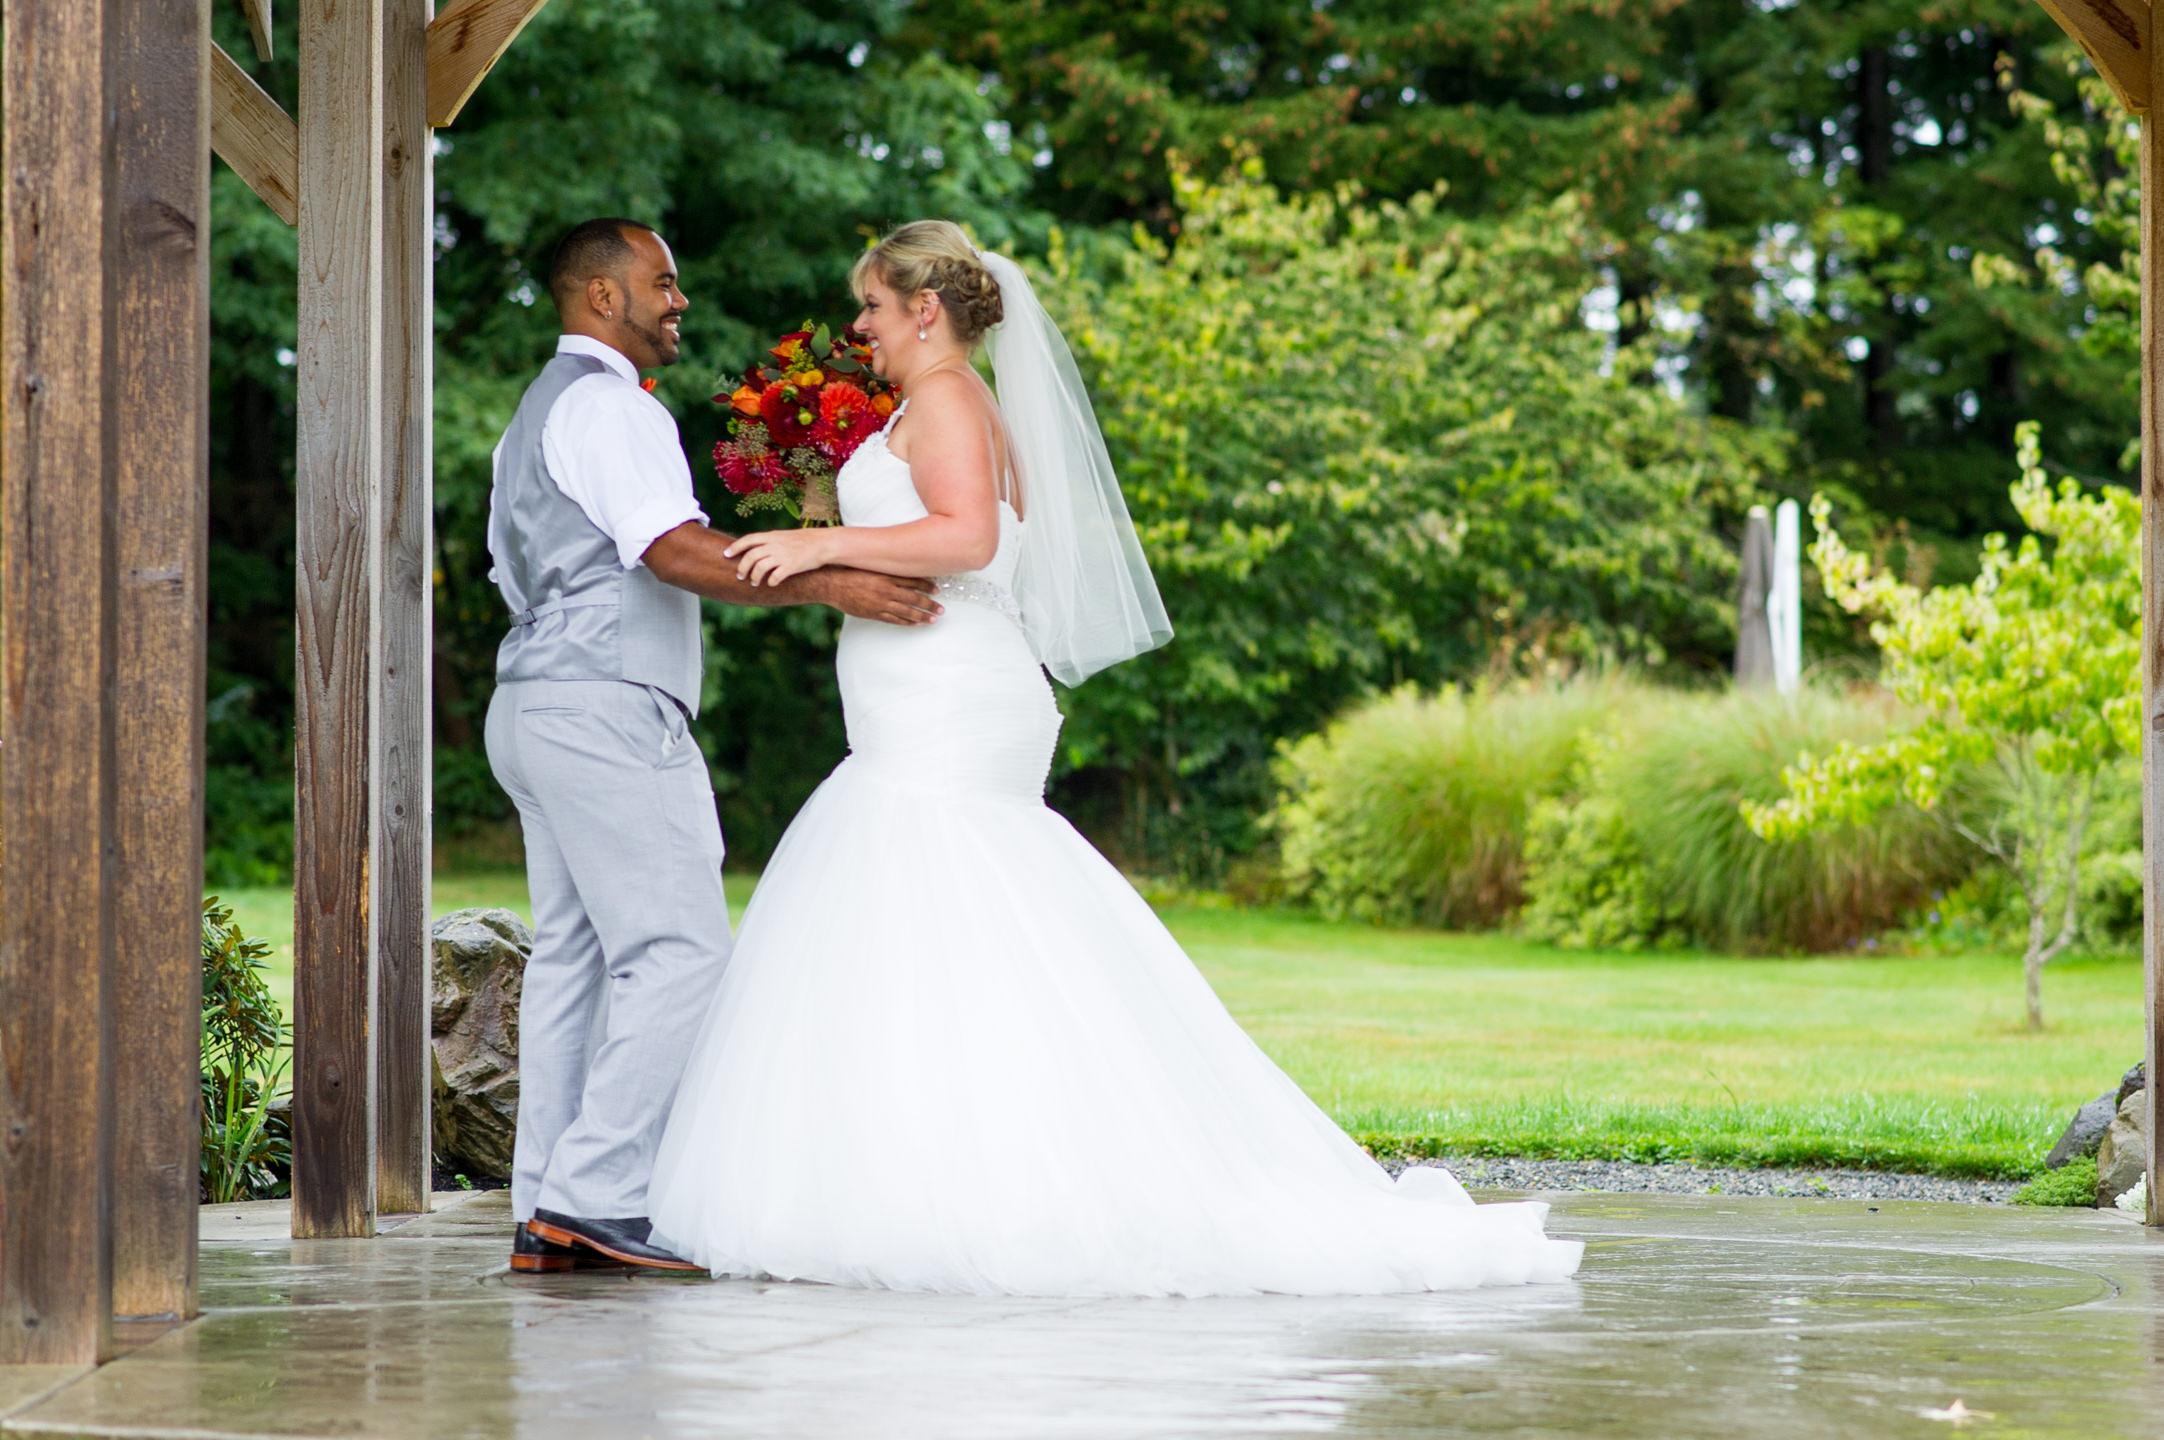 20160917_Tat_Renee and Marcus Wedding-20.jpg